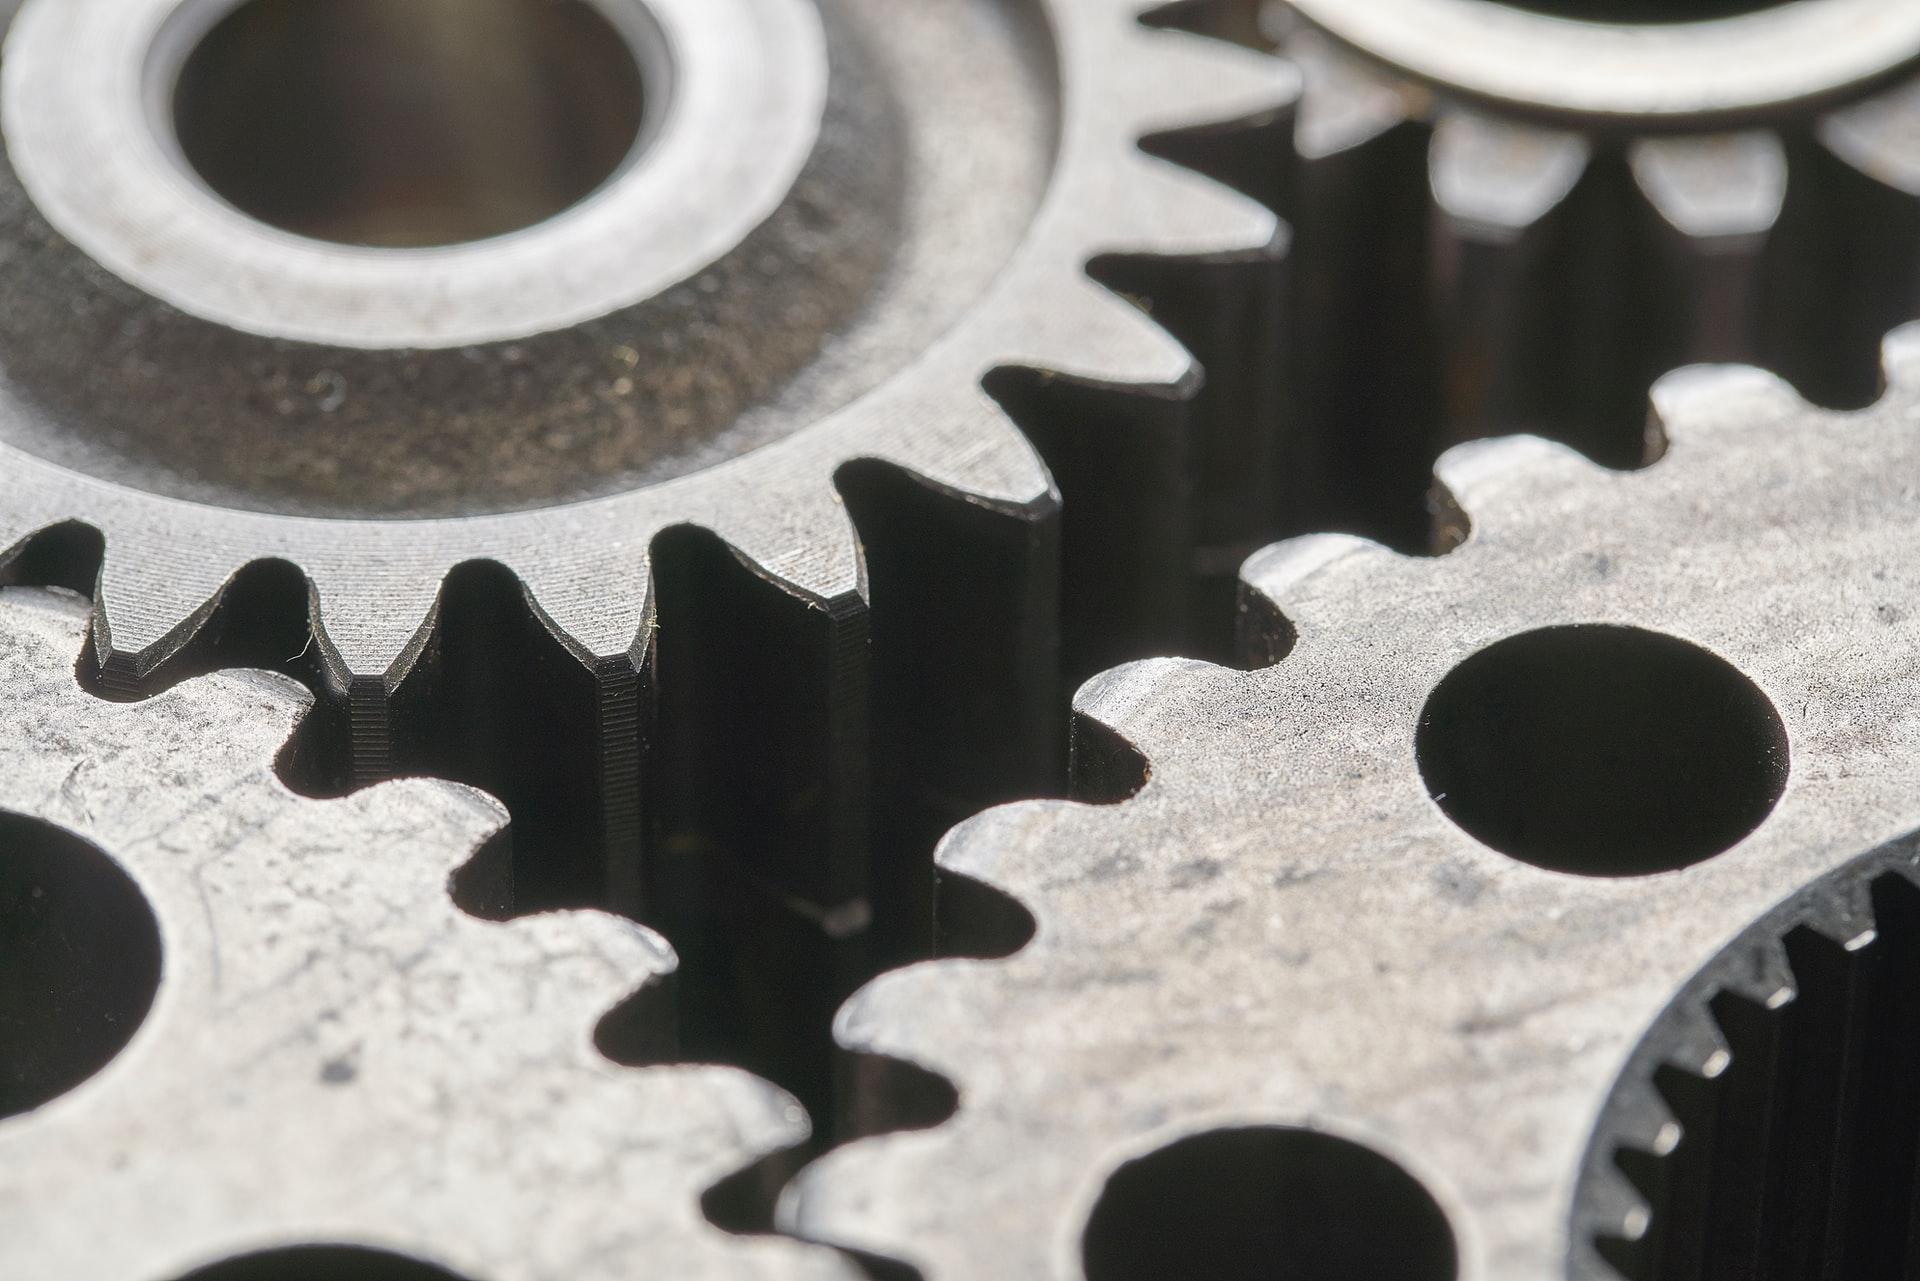 IXOPAY Announces Partnership with CashtoCode